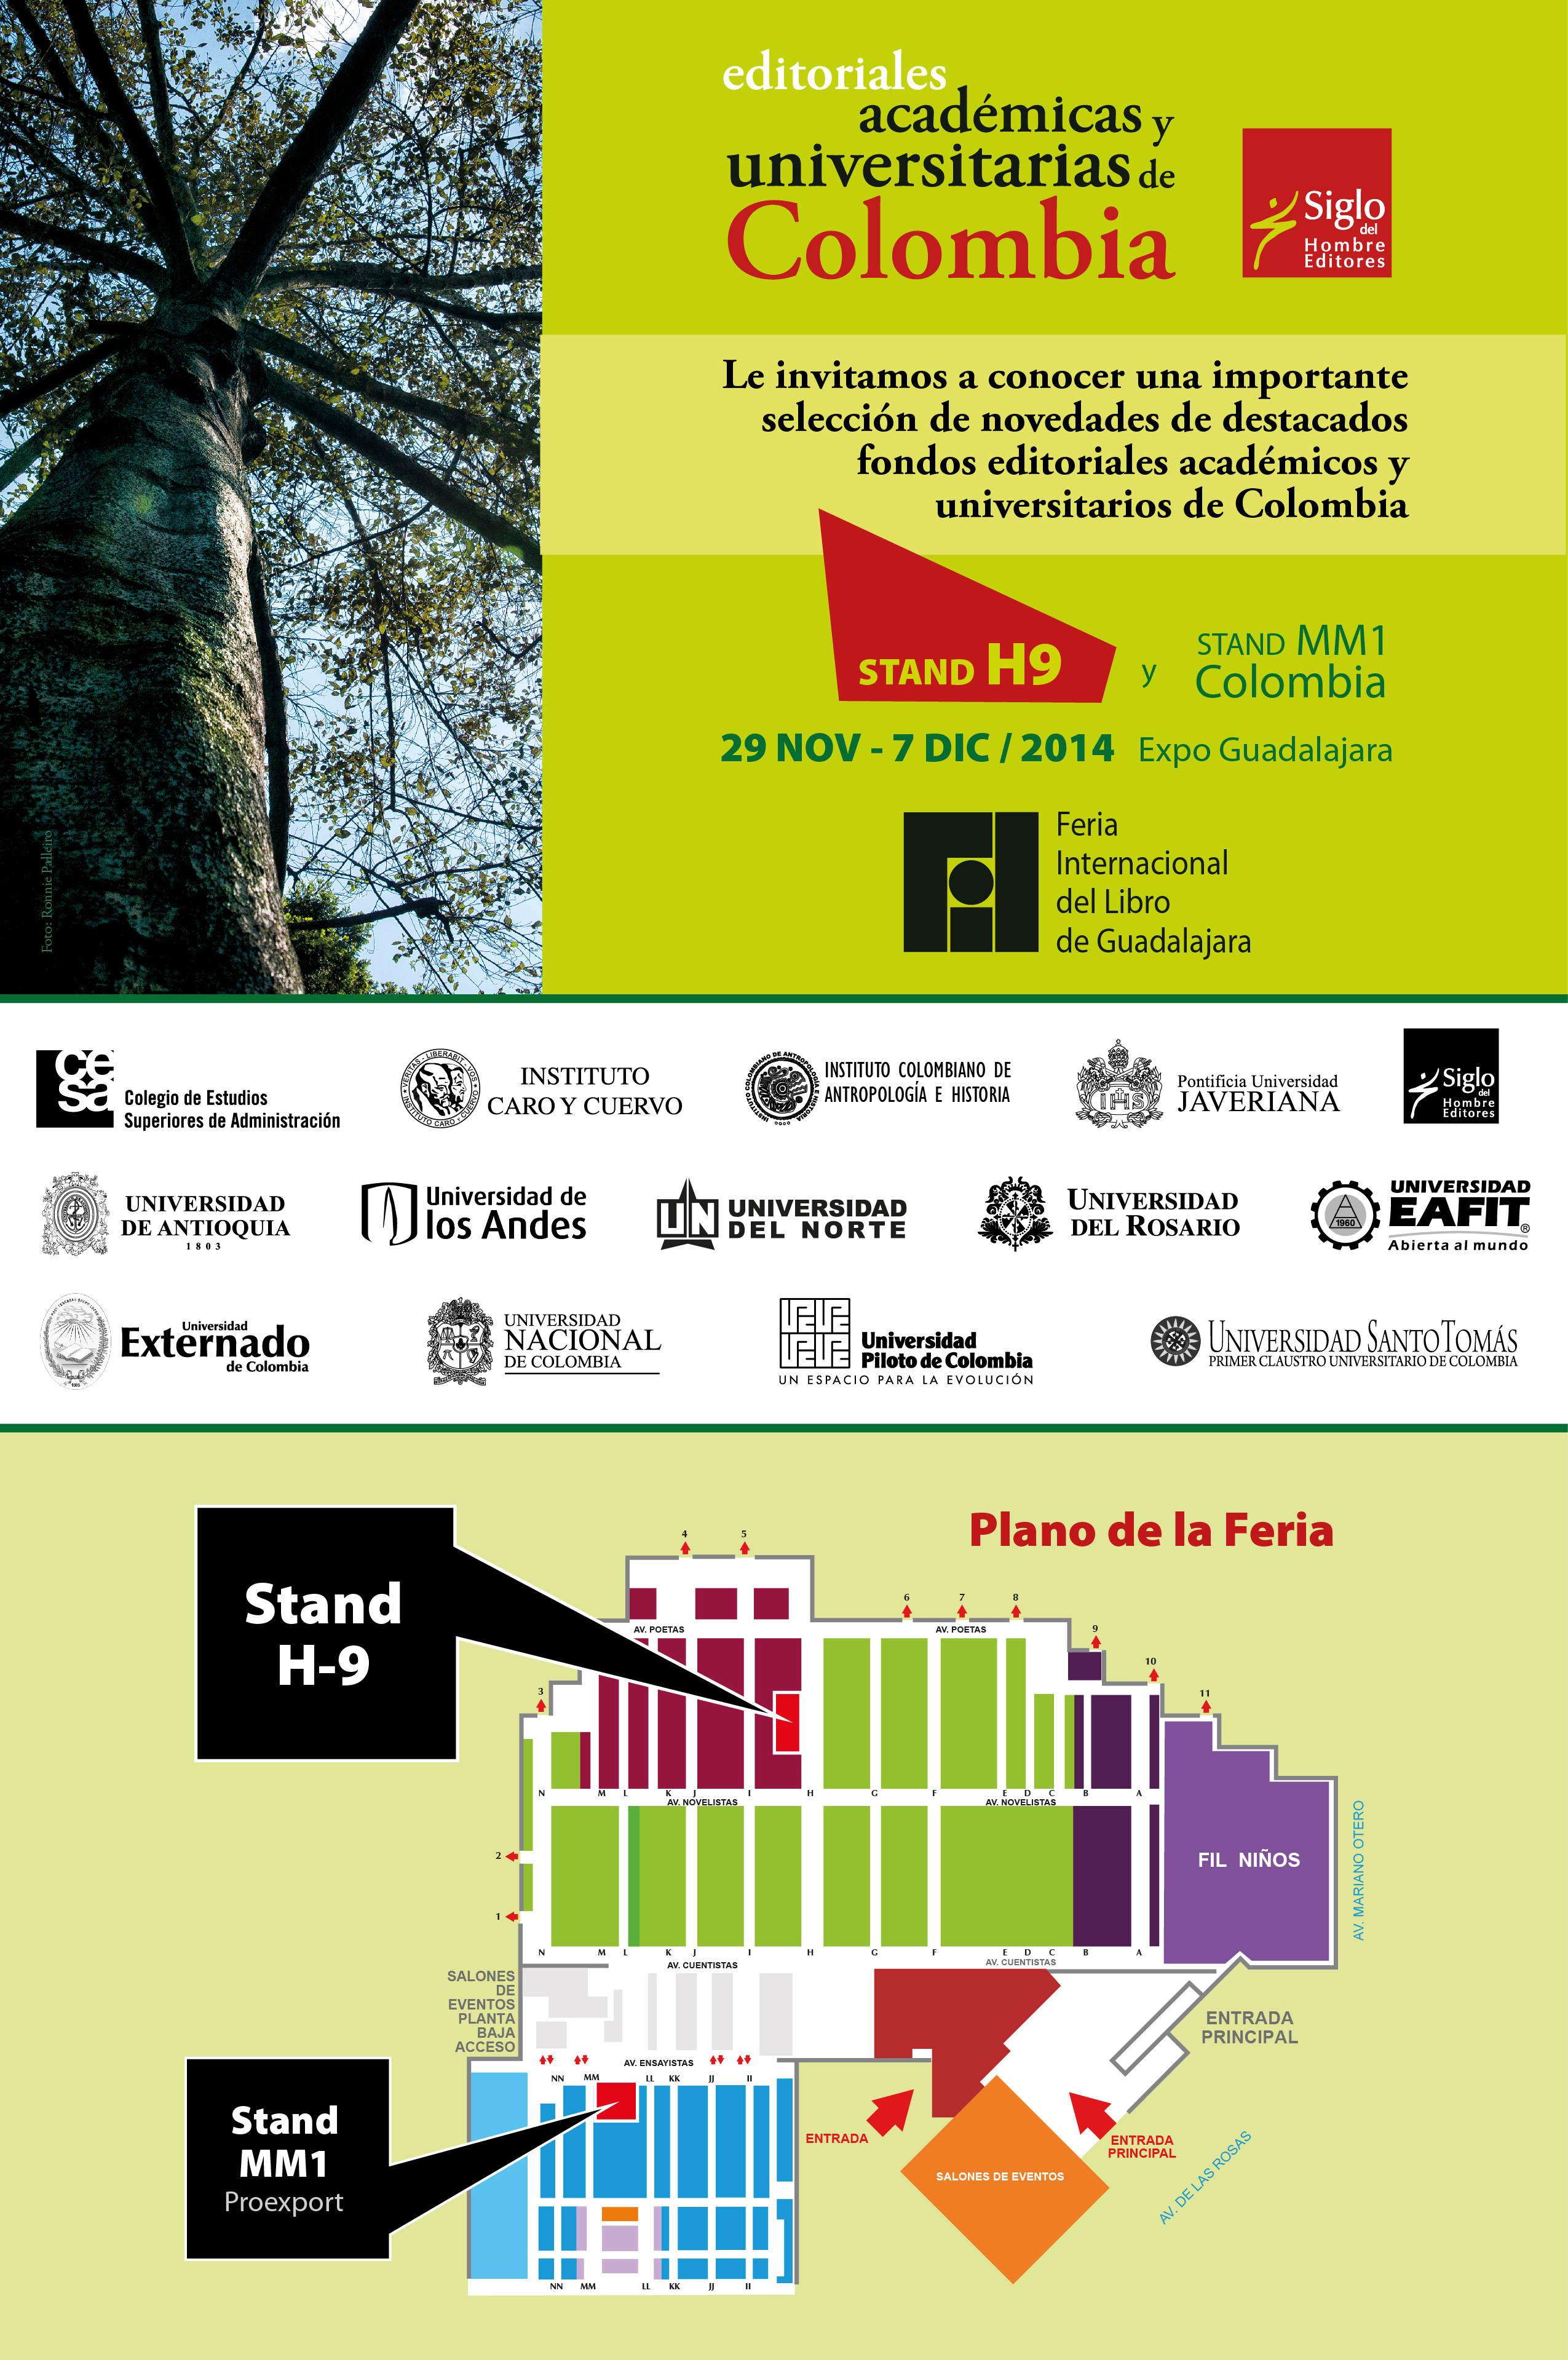 Feria del libro de Guadalajara 2014